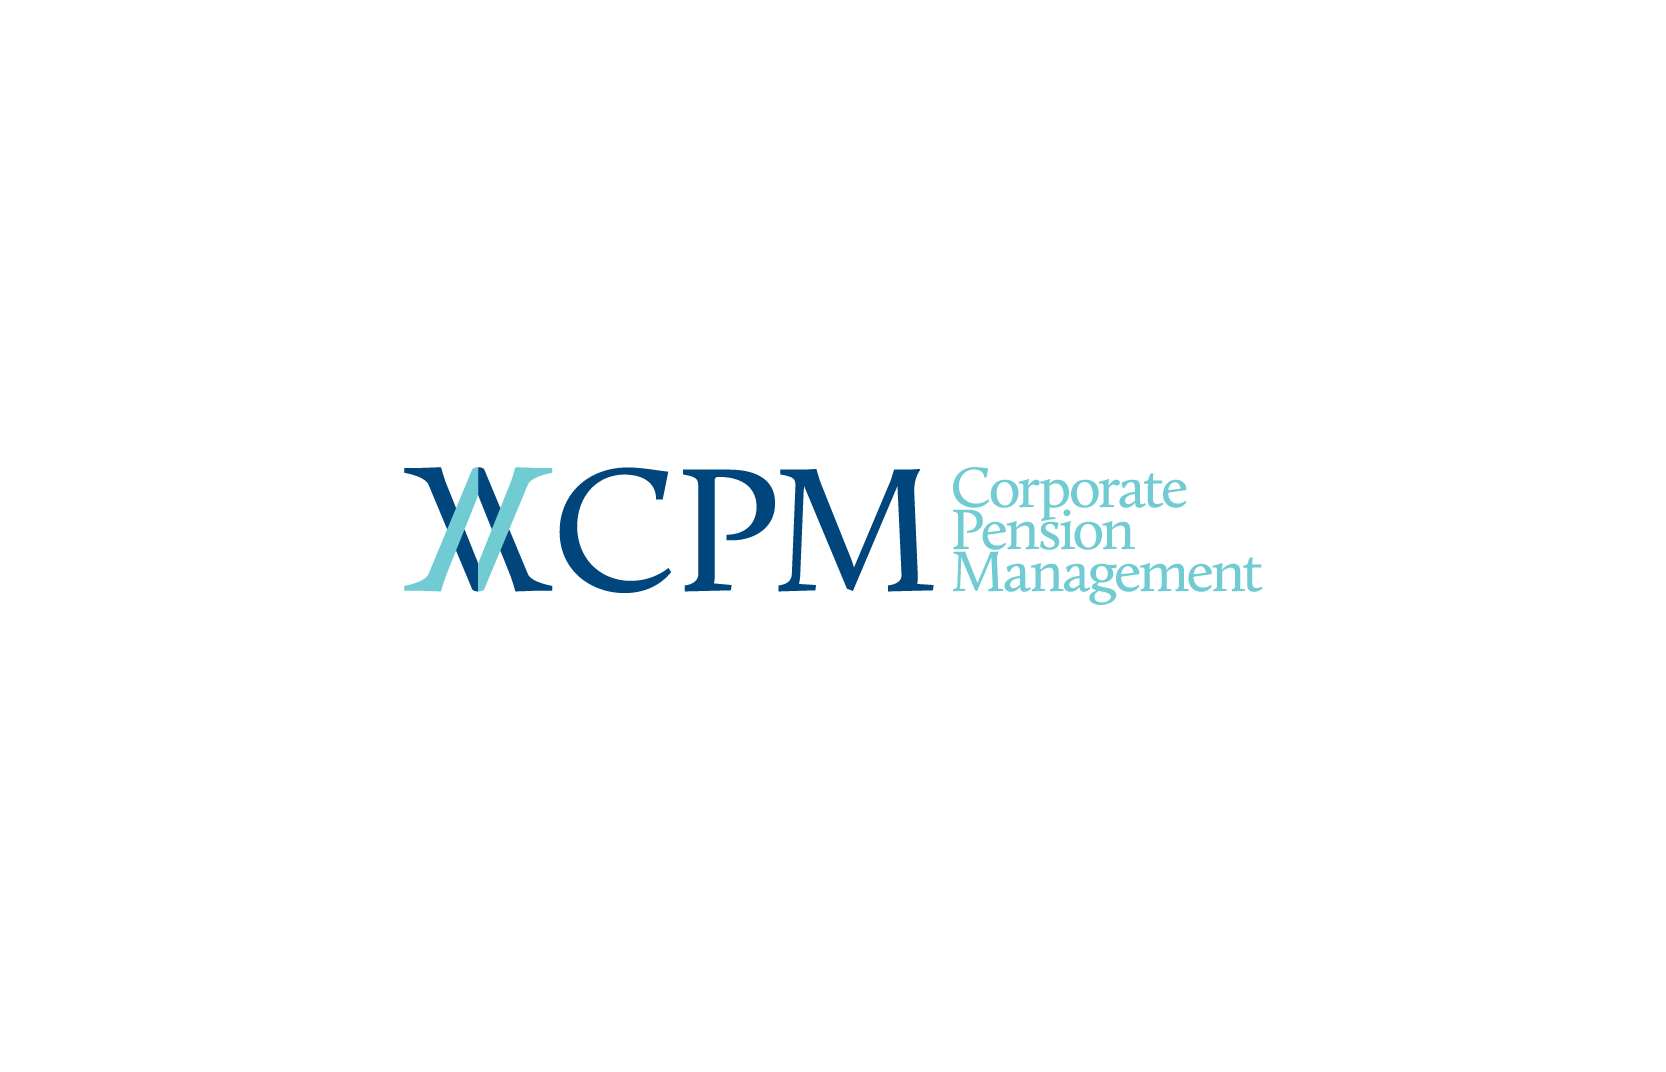 multi_cpm_logo1